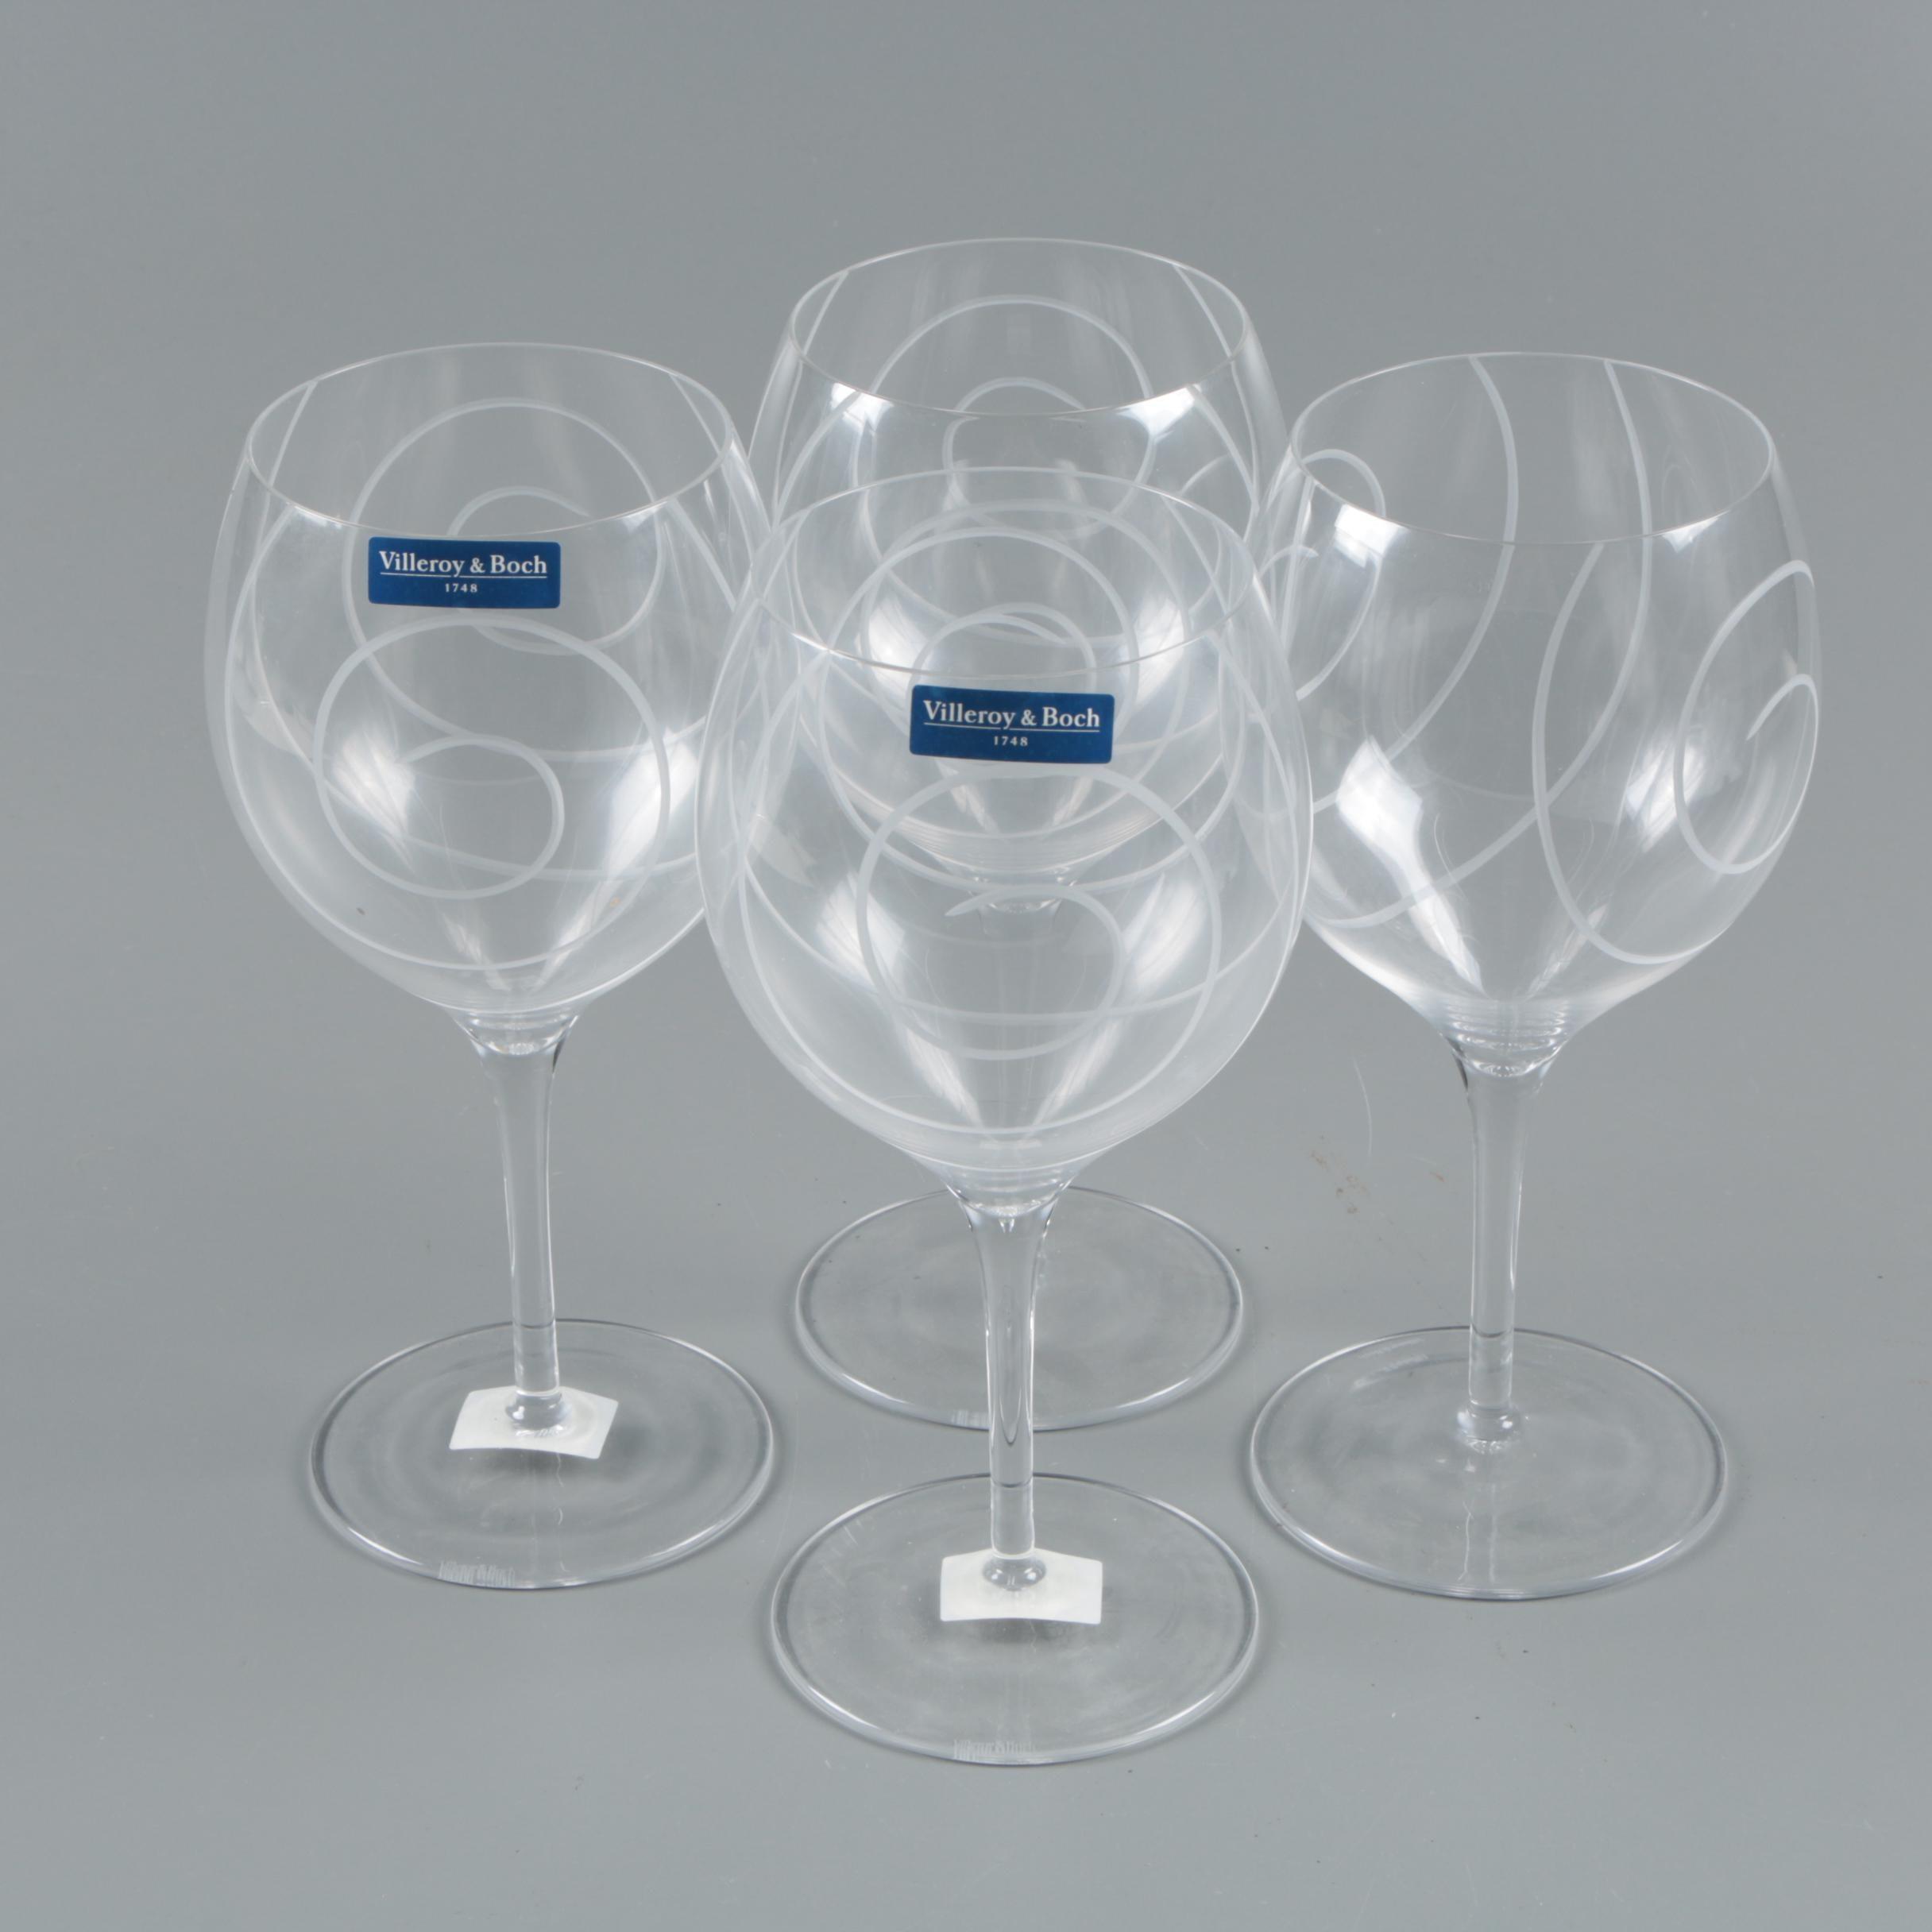 Villeroy & Boch Swirled Wine Glasses